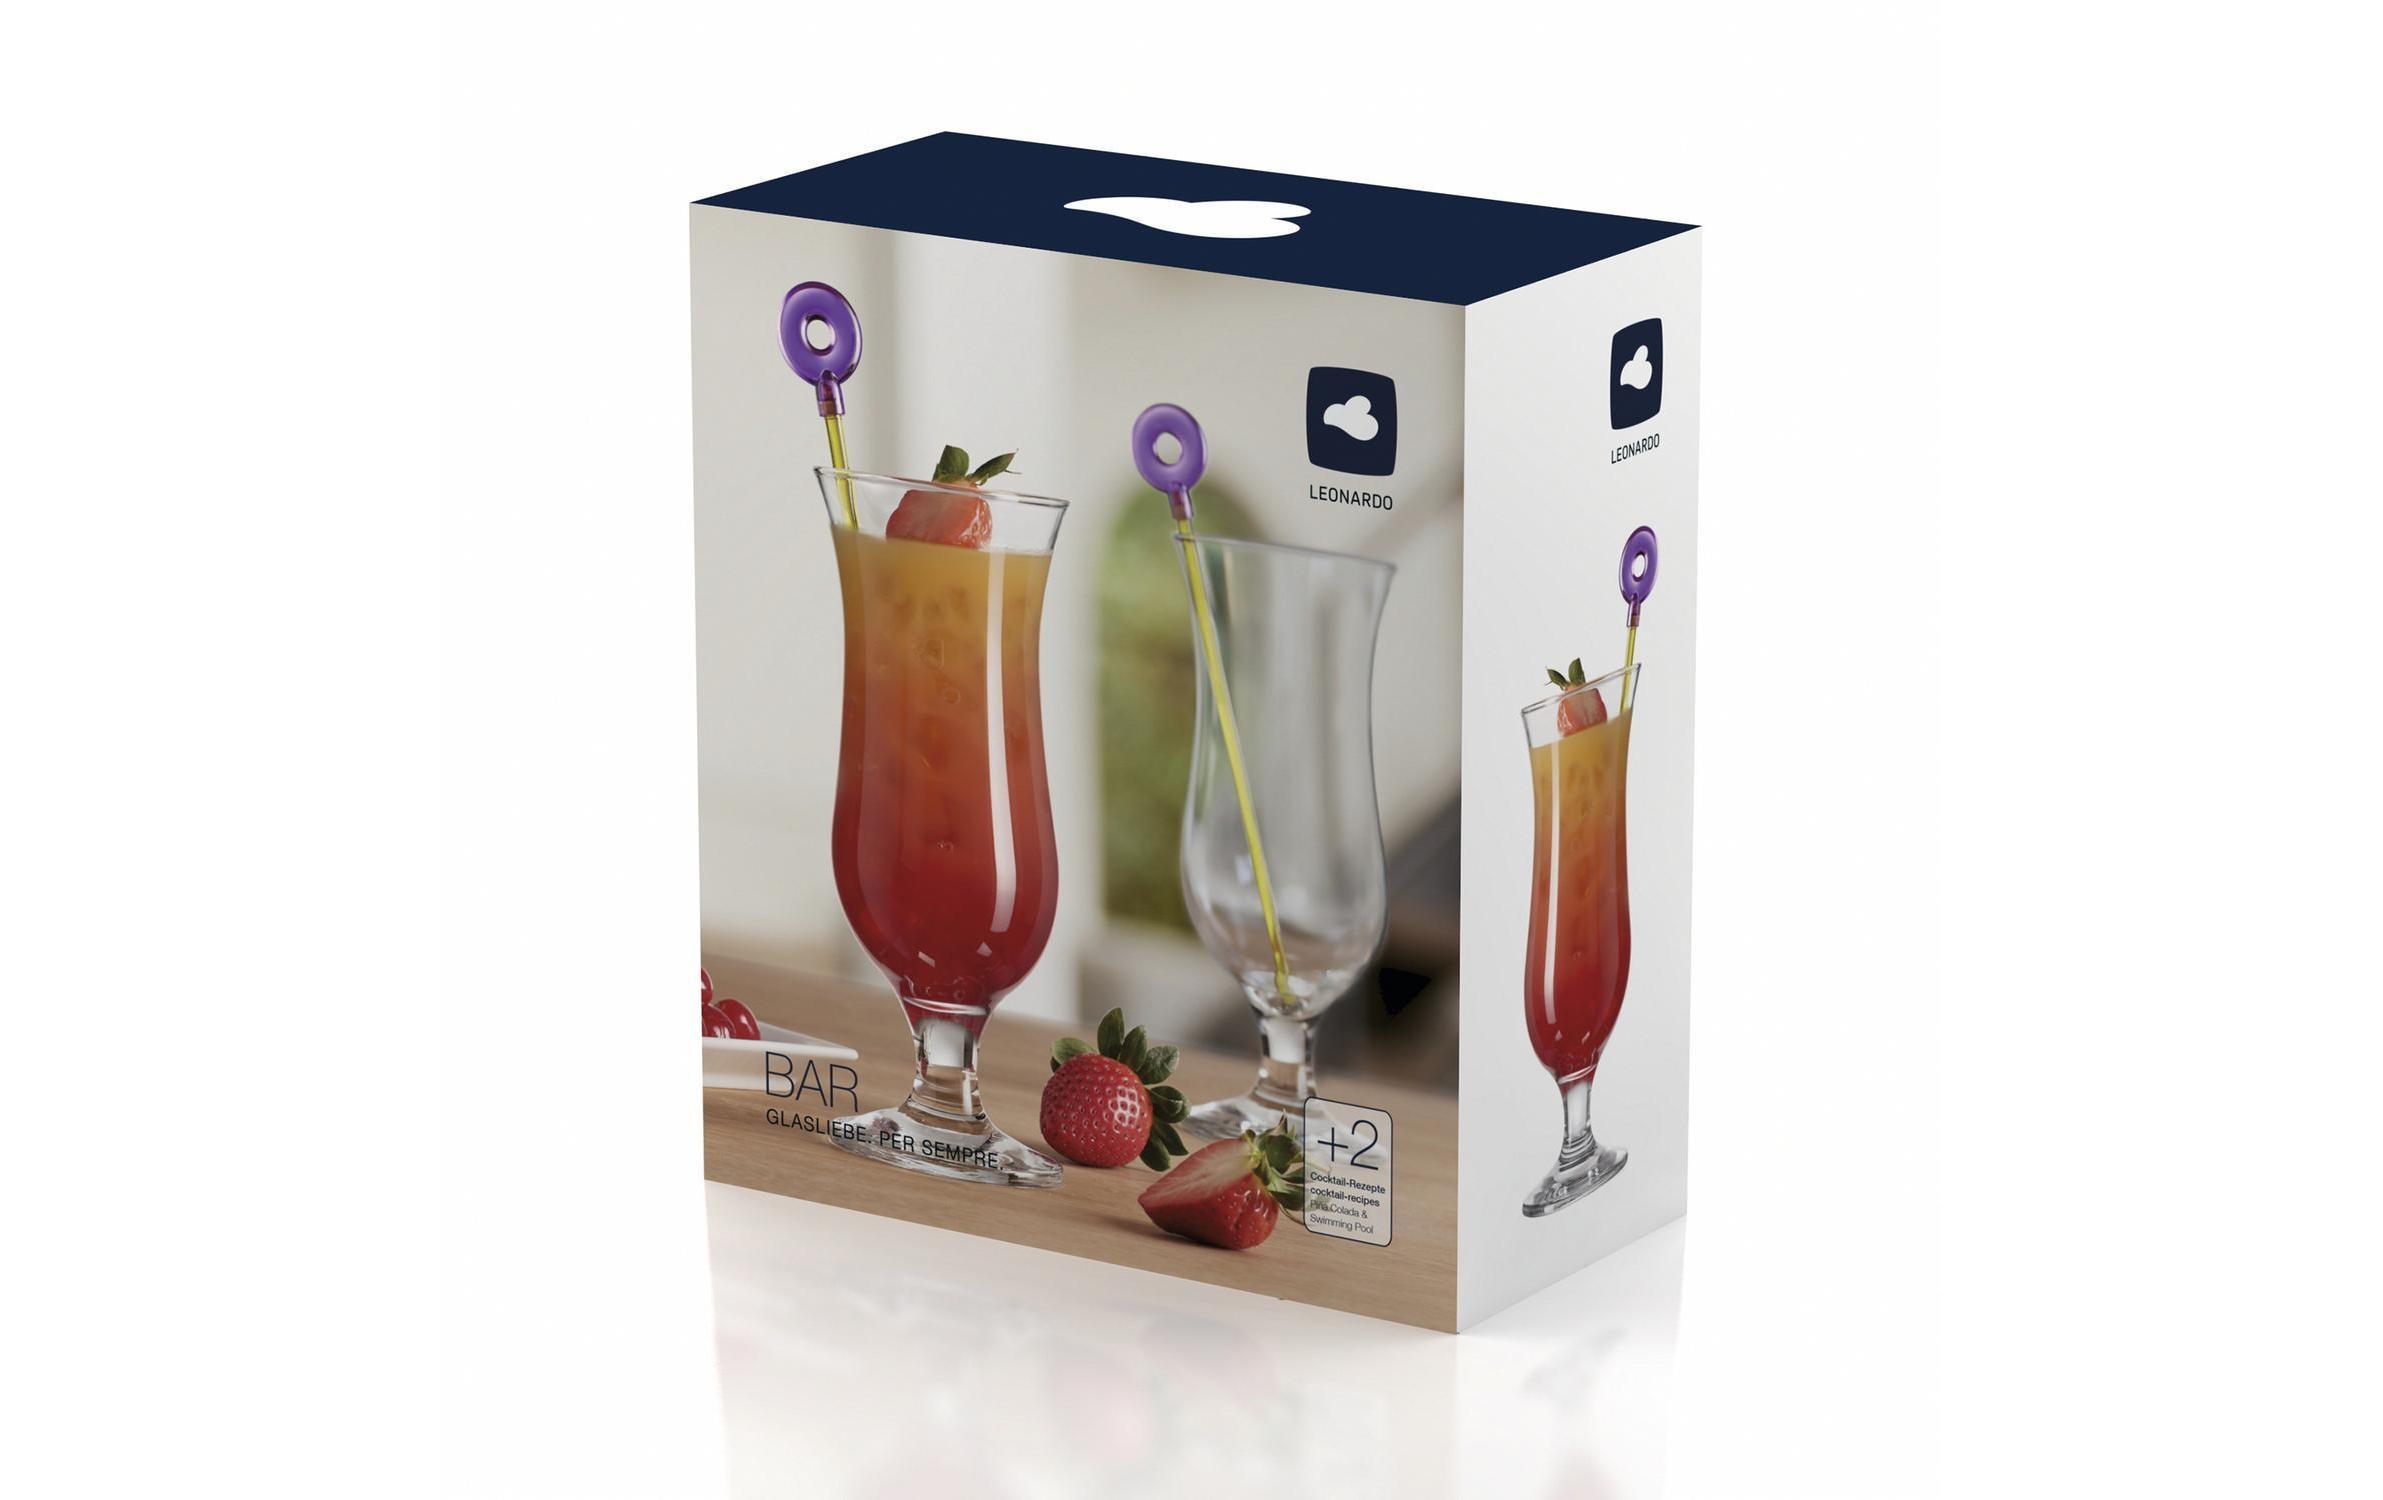 Leonardo Hurricane Glas 2er-Set Bar